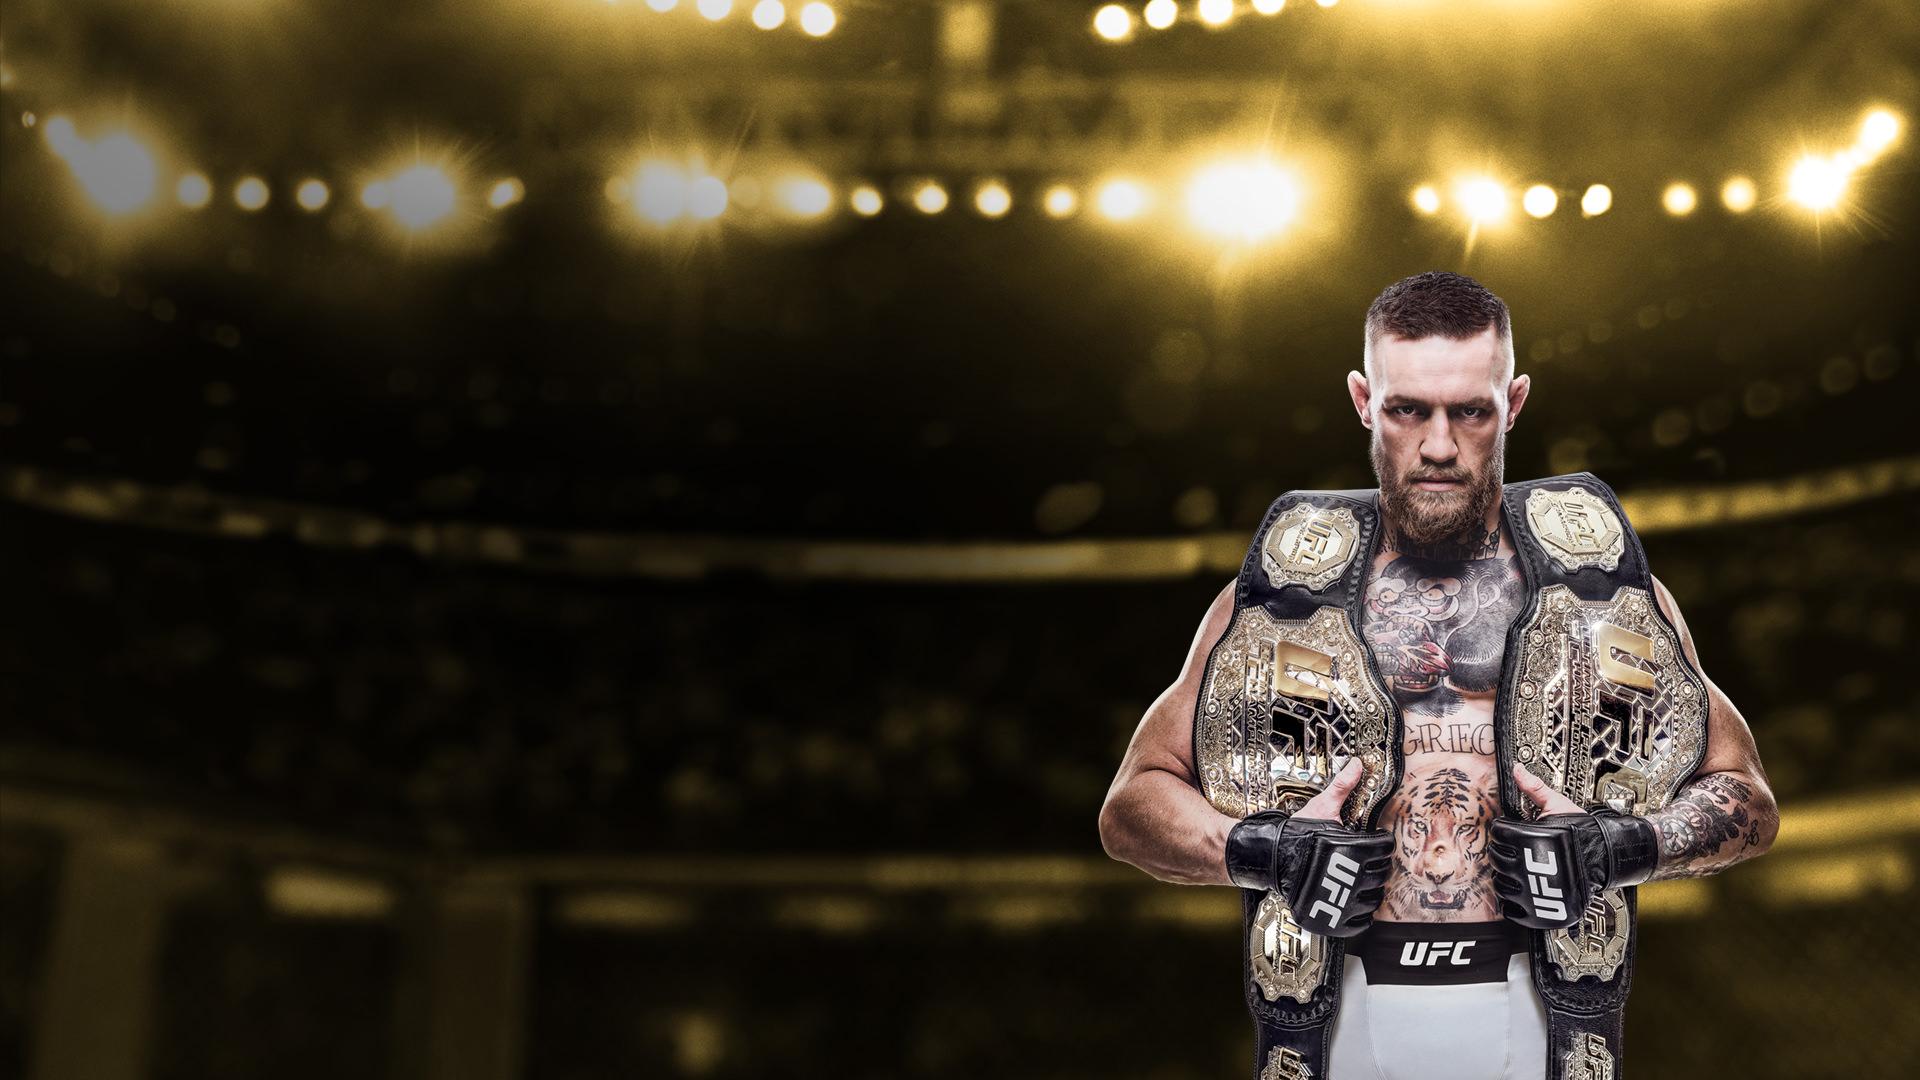 UFC 3 cover photo